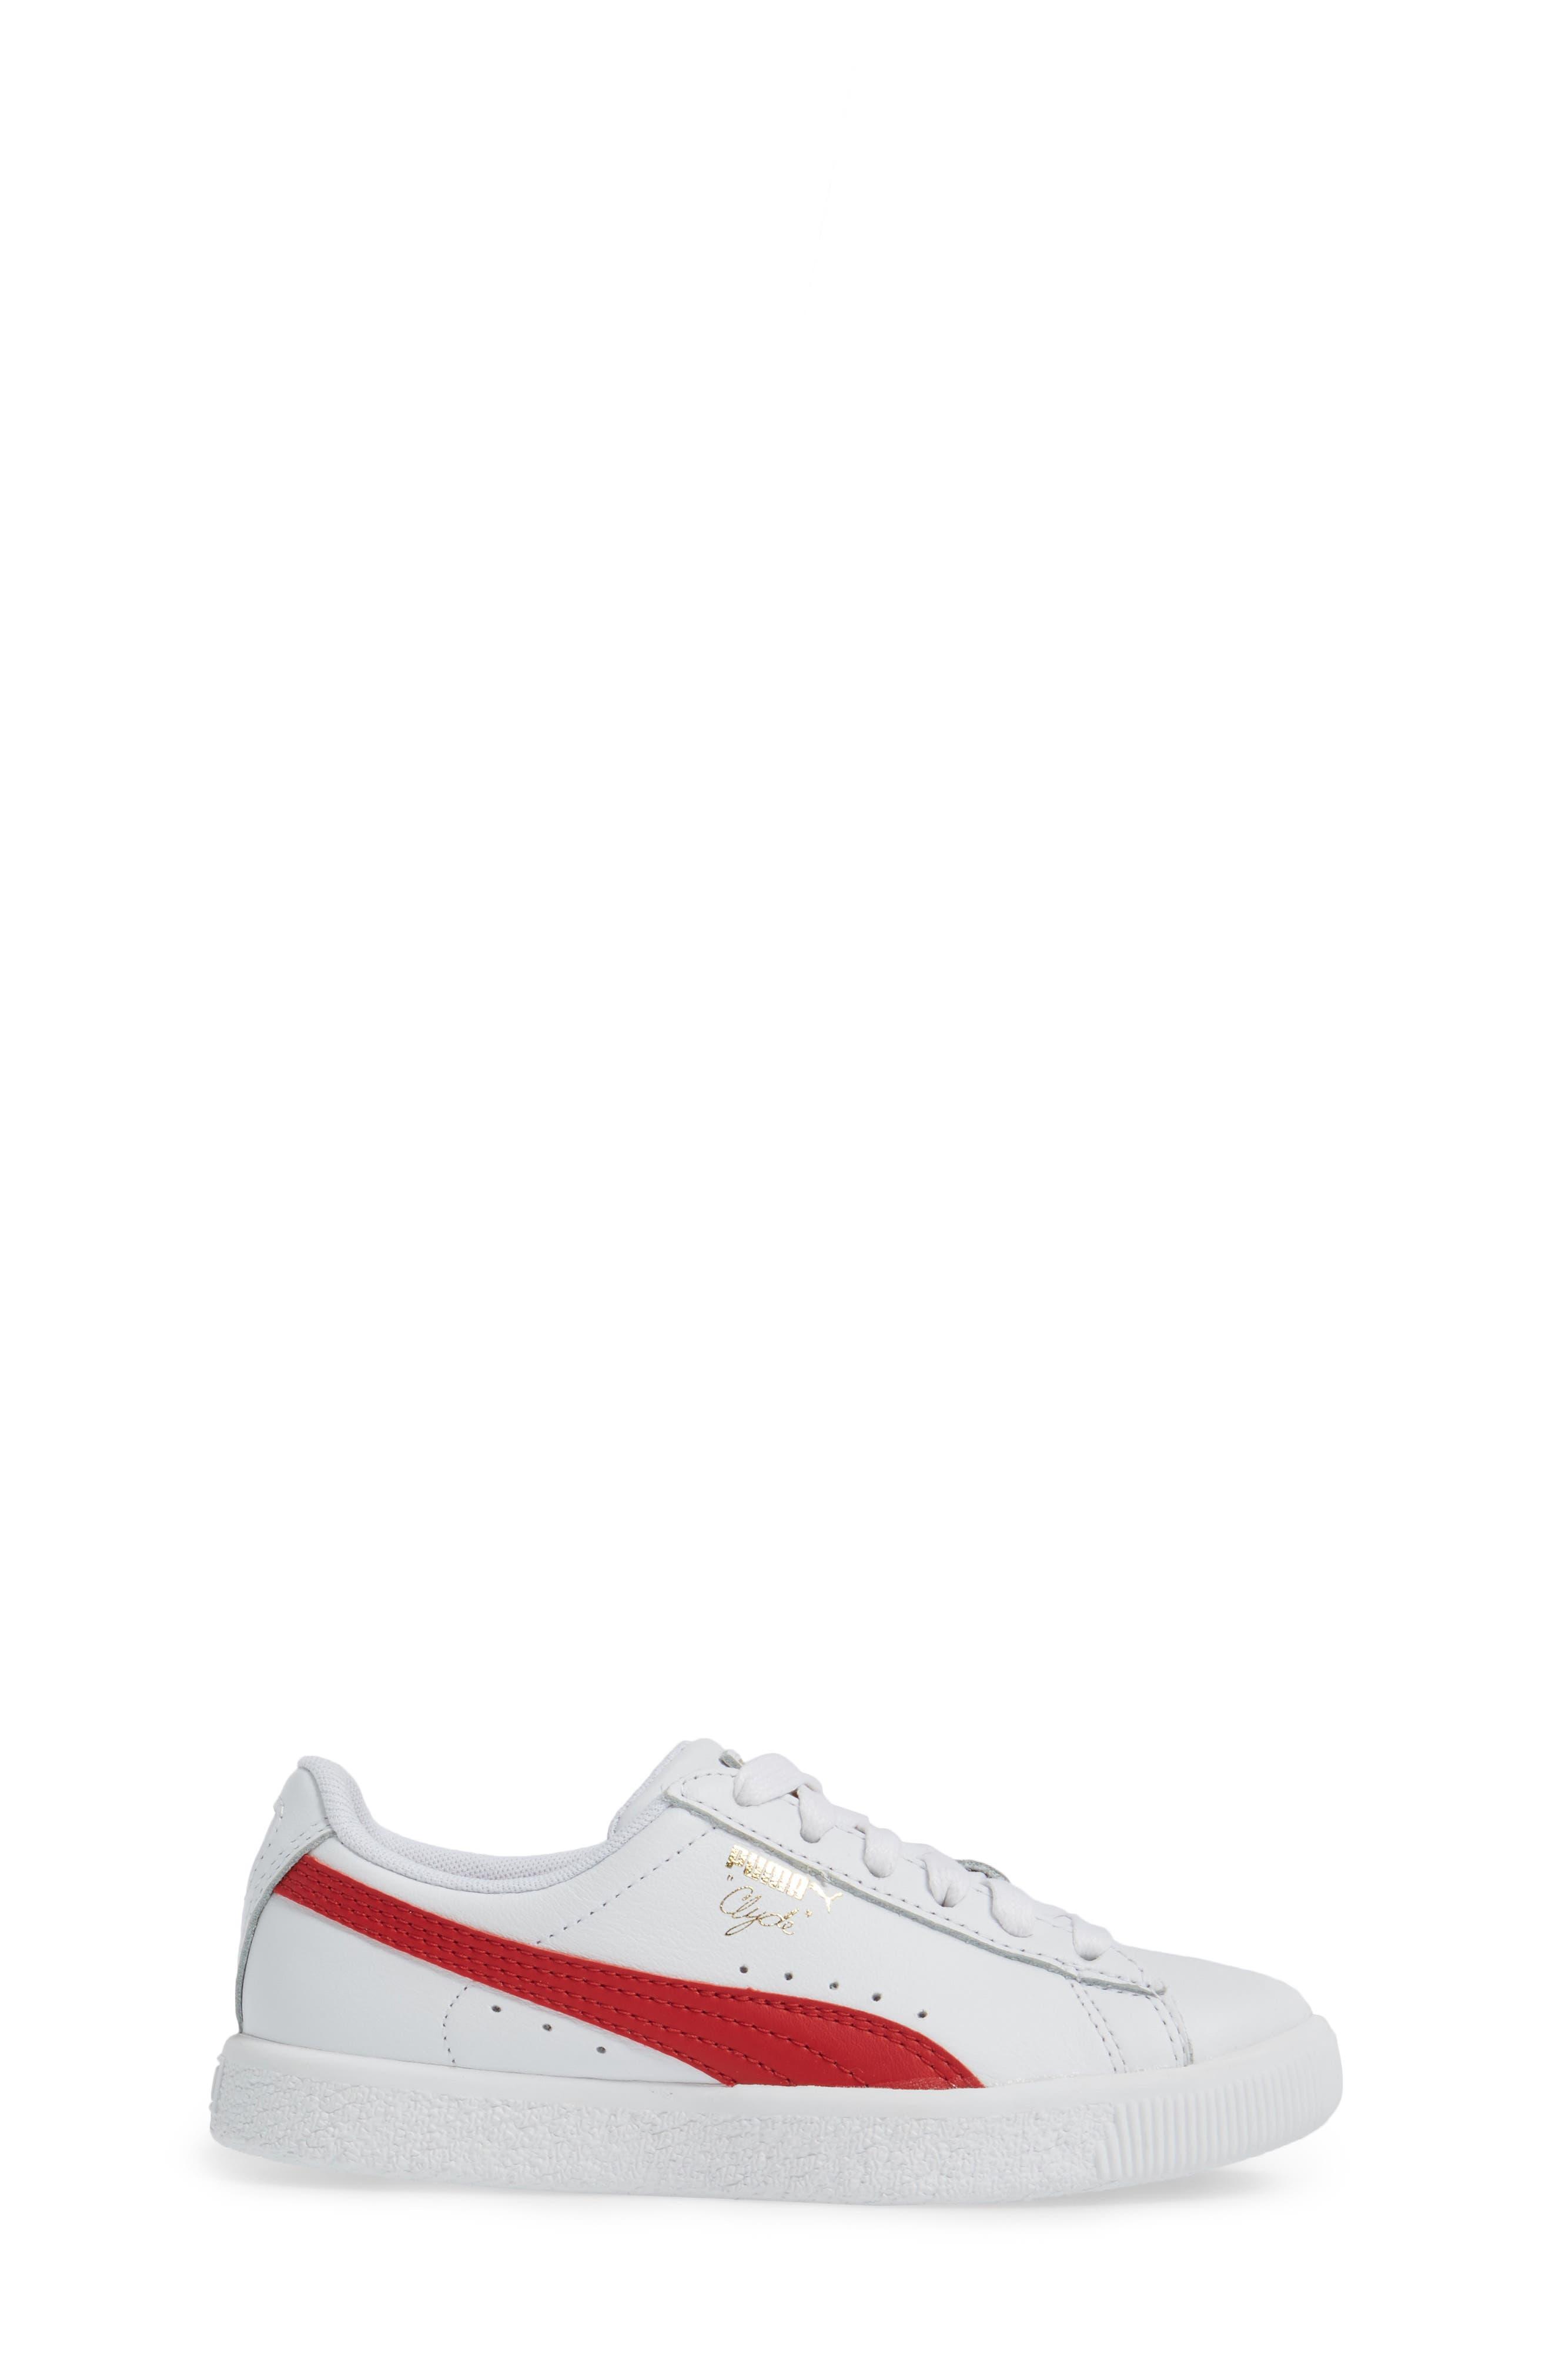 Clyde Core Foil Sneaker,                             Alternate thumbnail 3, color,                             White/ Cherry